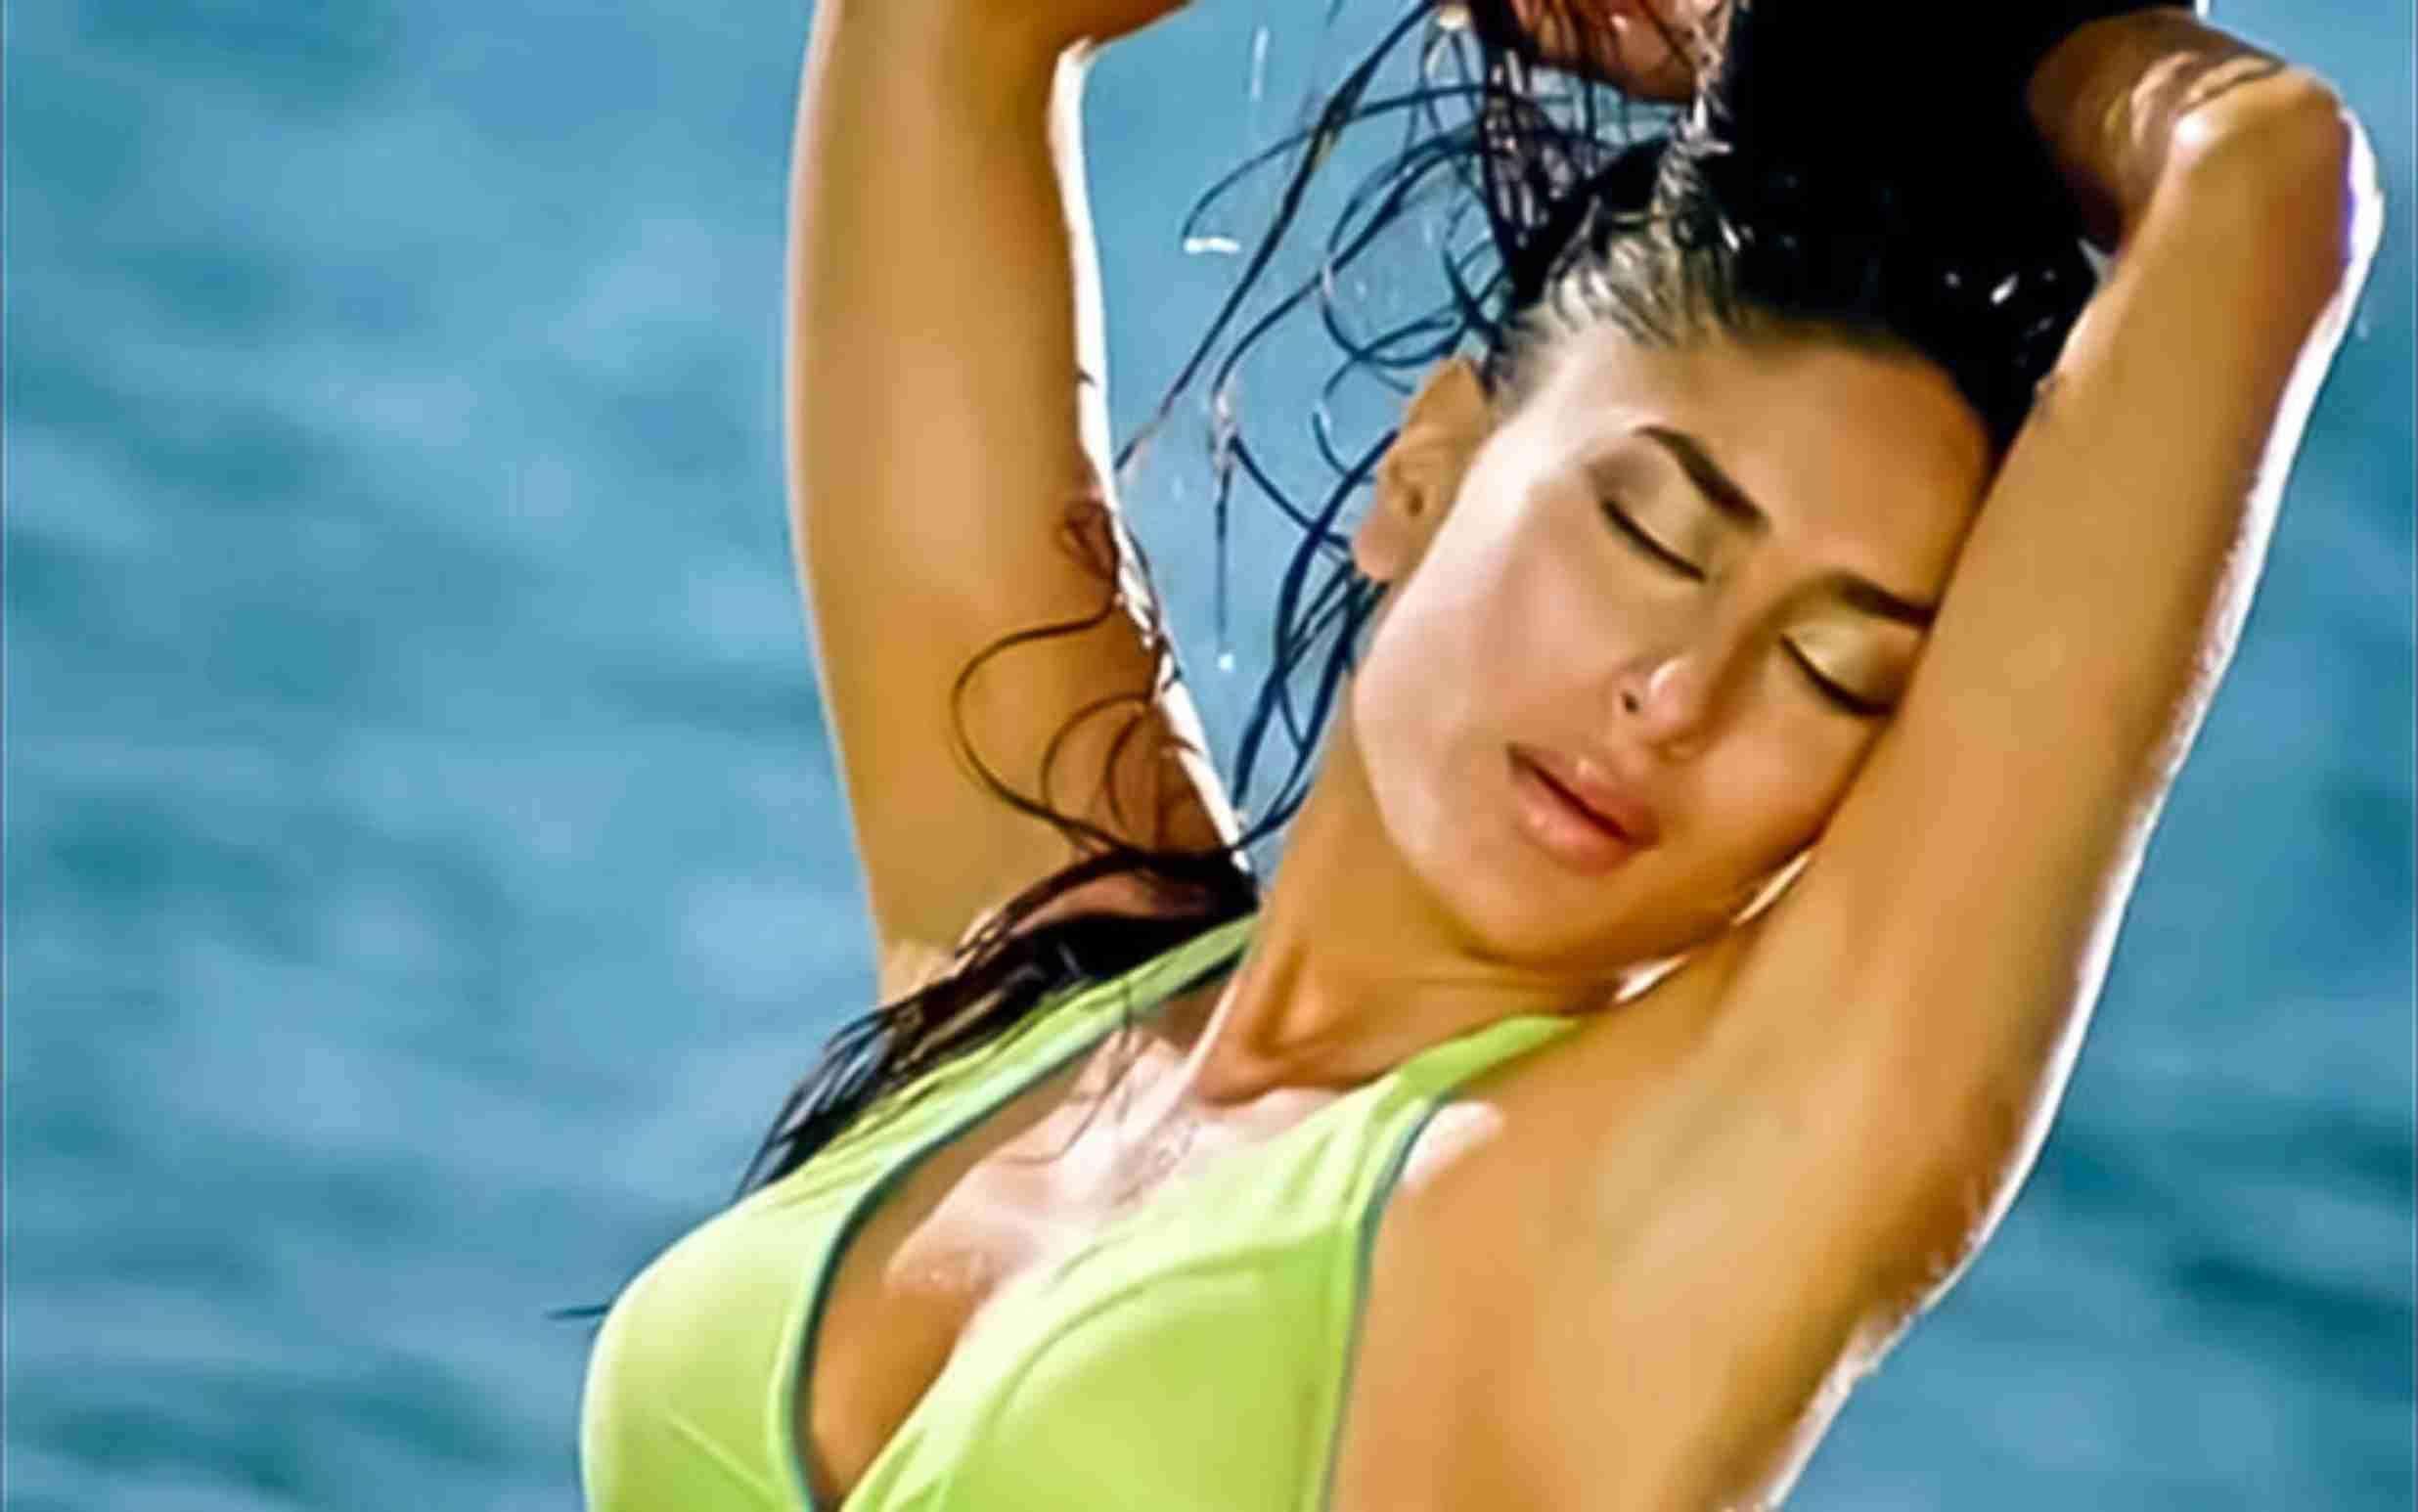 Kareena Kapoor Sexy-Hot Video: करीना कपूर का Sexy-Hot वीडियो सोशल मीडिया पर हुआ वायरल, Hot वीडियो में जबरदस्त मूव्स देख फैंस का हो रहा बुरा हाल